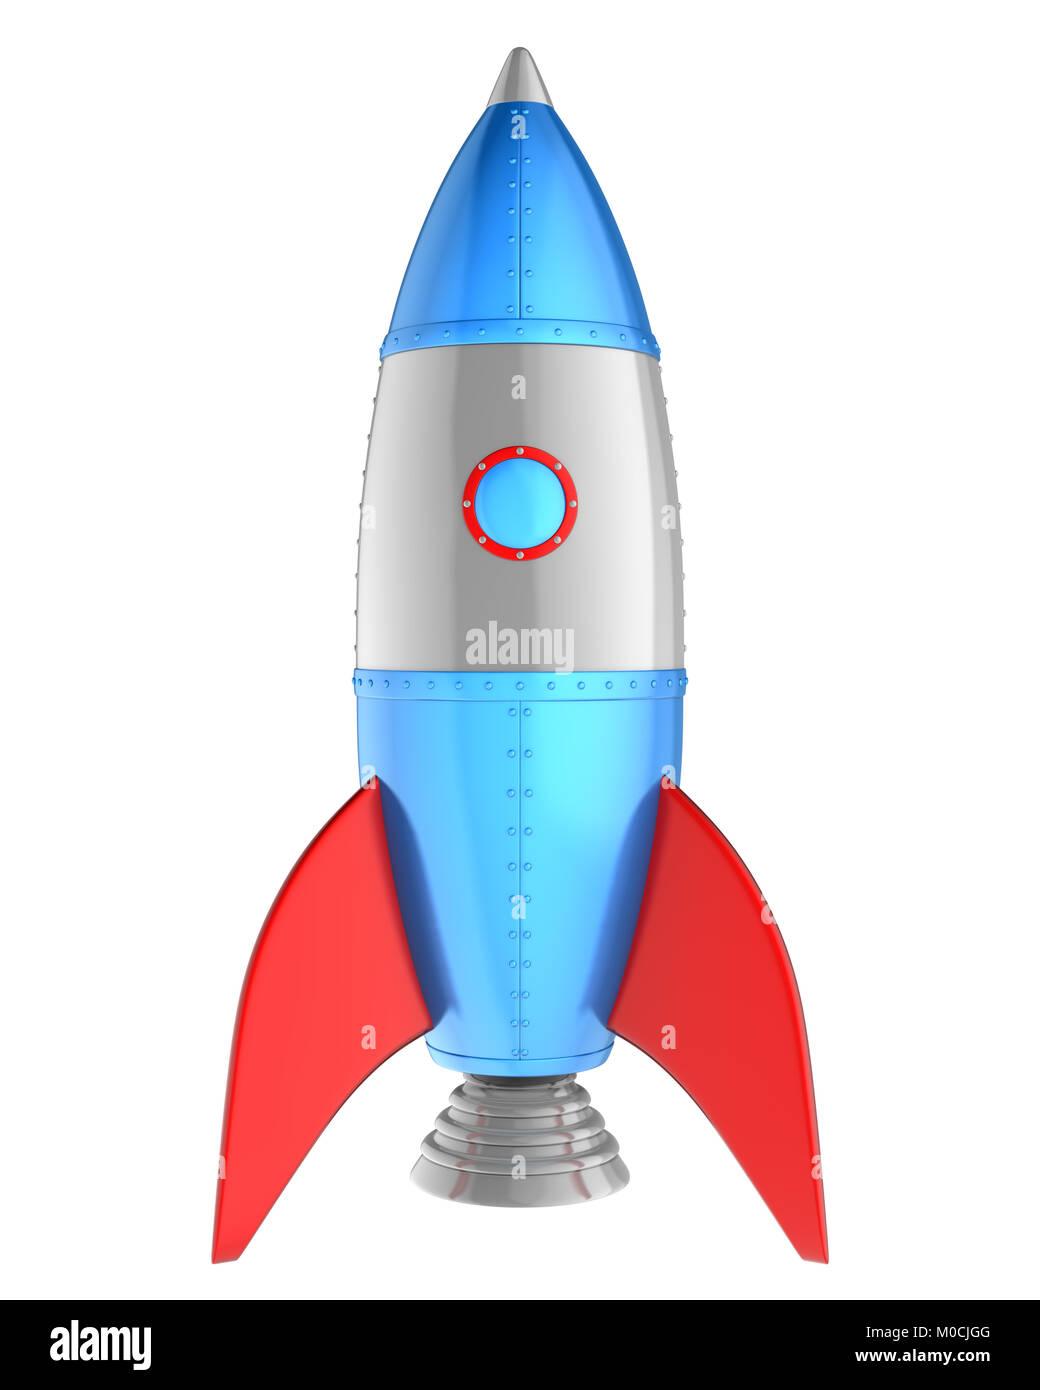 Cartoon rocket isolated on white. 3D illustration - Stock Image